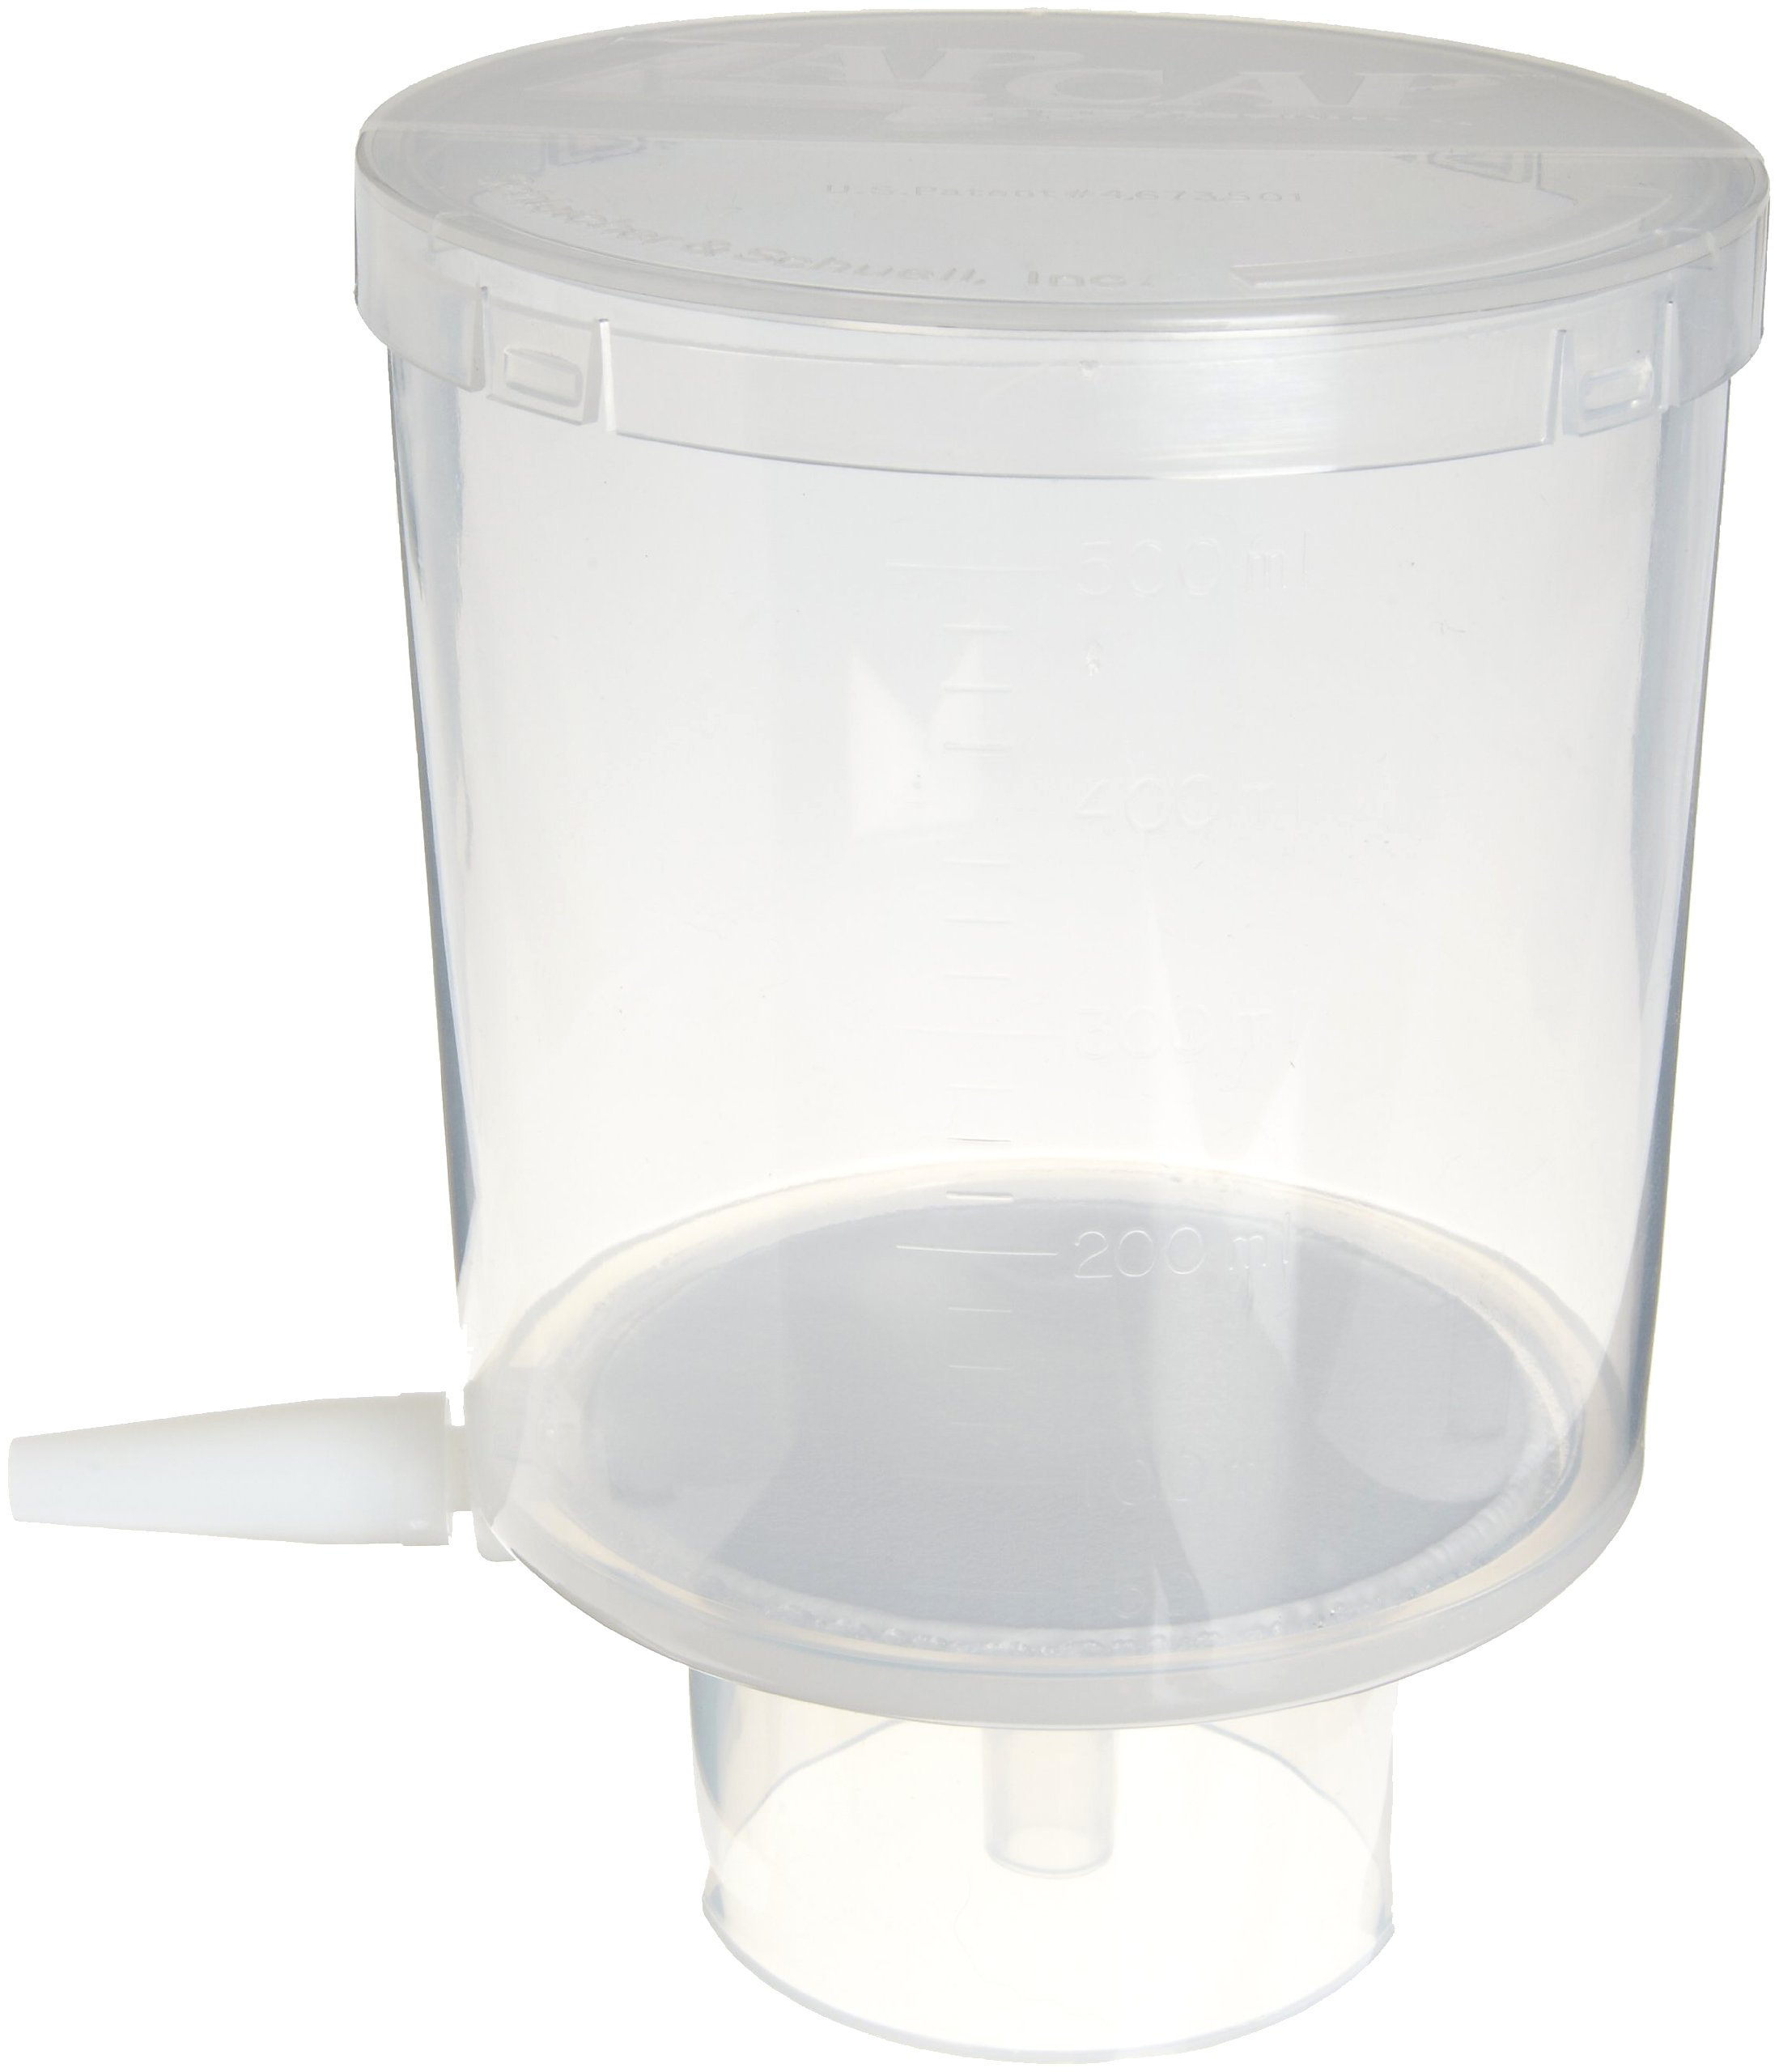 Whatman 10443421 ZapCap Cellulose Regenerated Bottletop Filter Unit, Nylon Membrane, 0.2 Micron, 500mL Volume (Pack of 12)